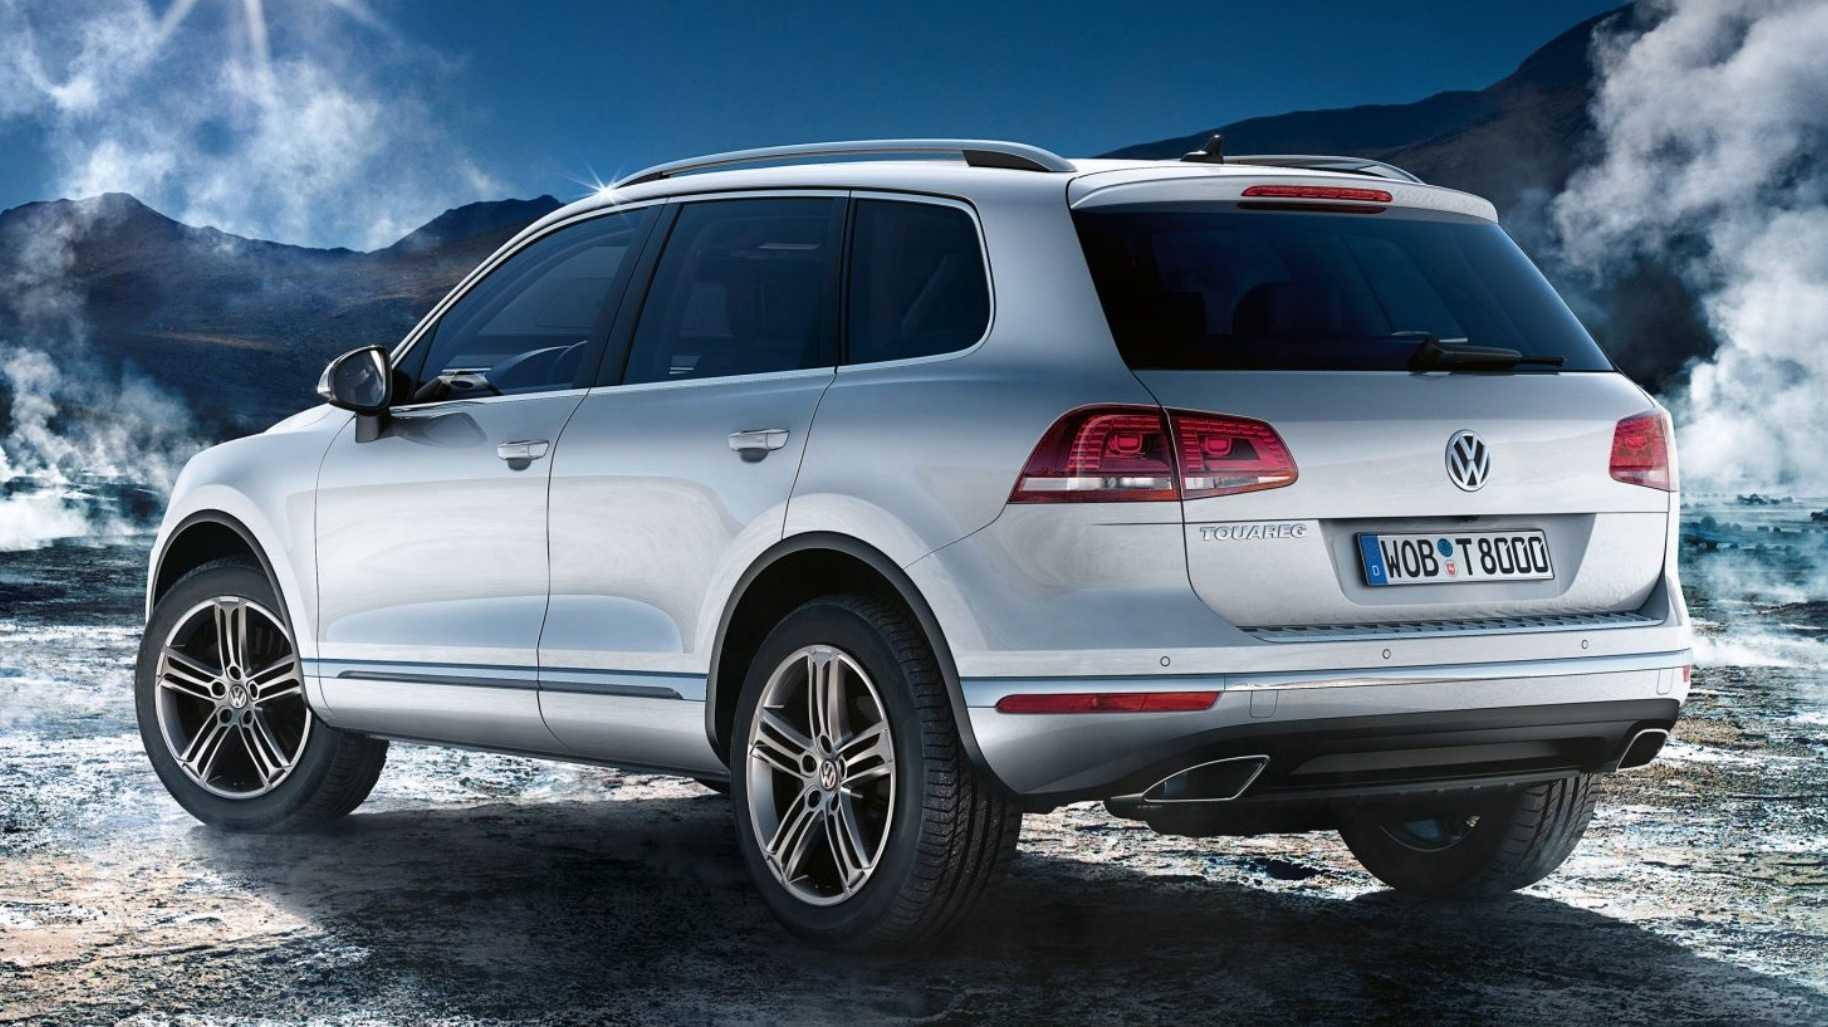 Abgas-Skandal: Unzulässige Abschalteinrichtung im VW Touareg – KBA verordnet Rückruf